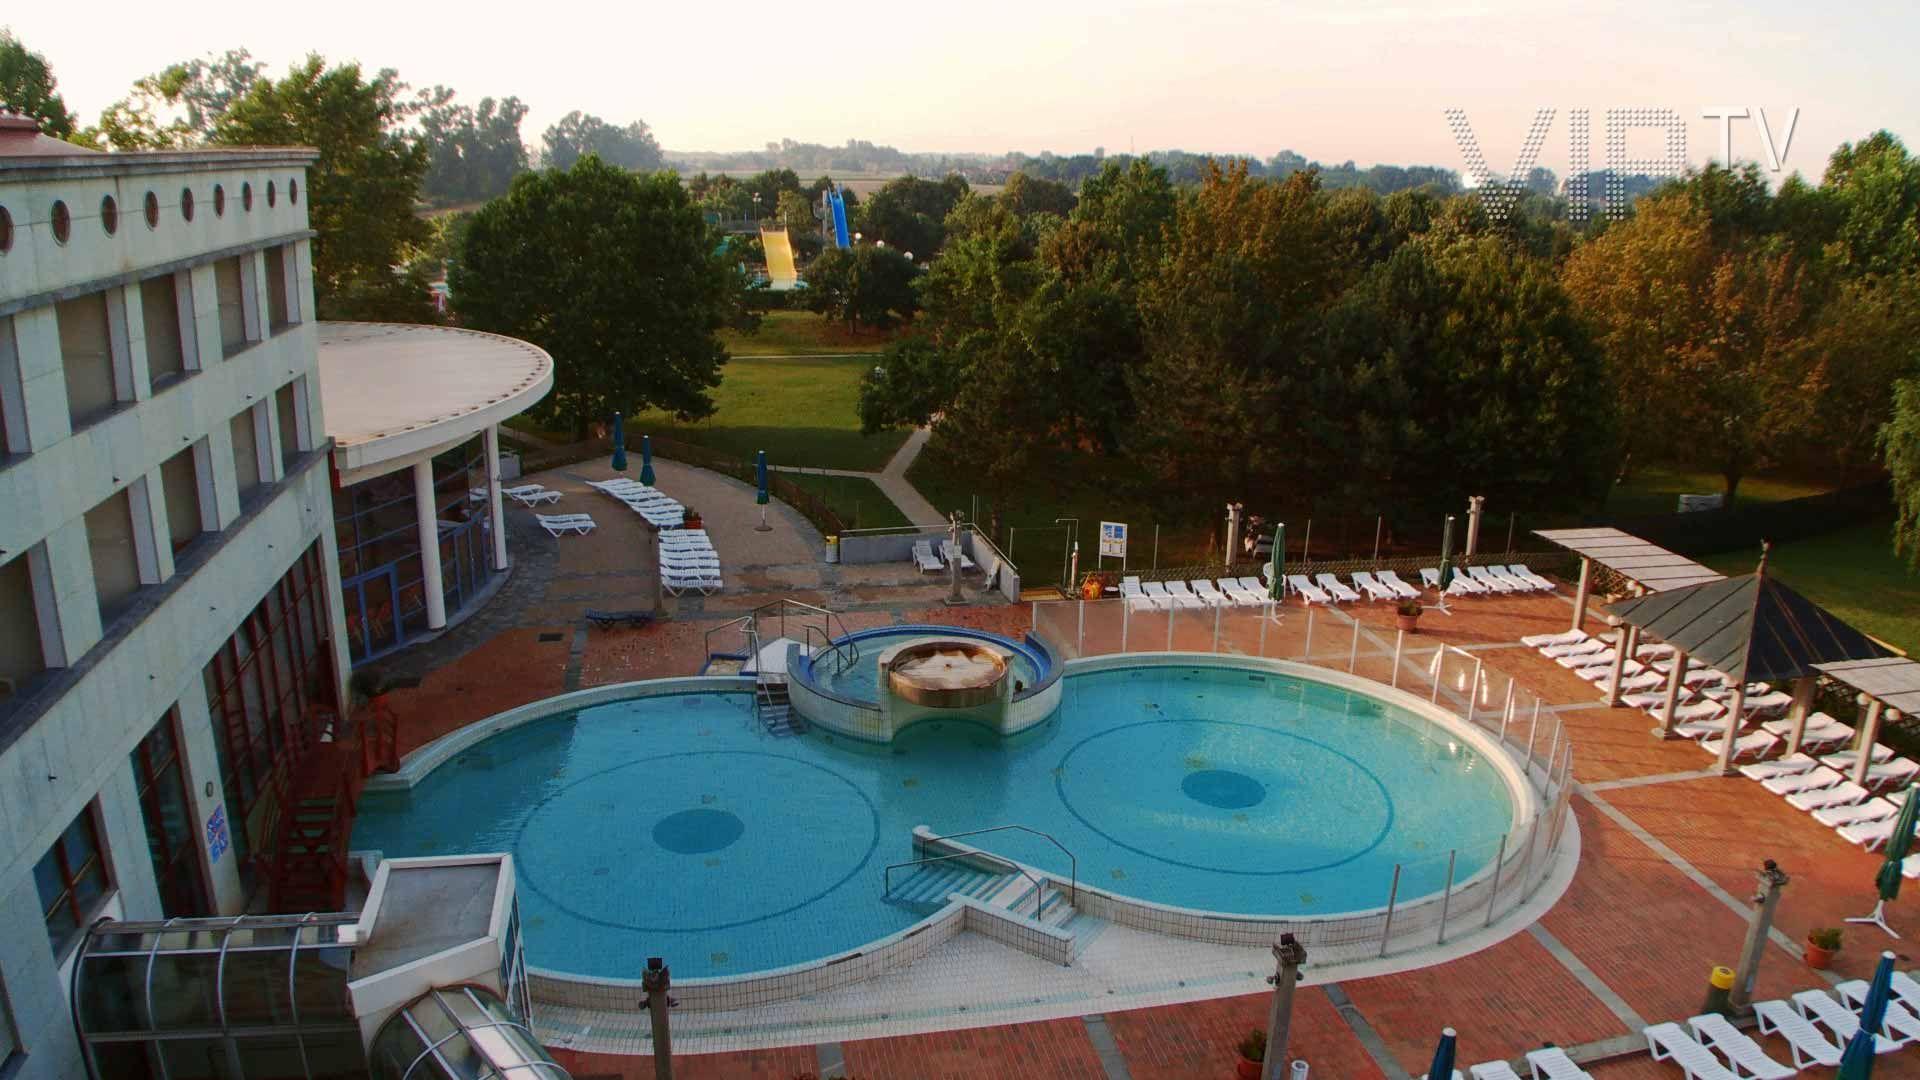 Hotel Lipa - Terme Lendava - SAVA hotels & resorts, lendava, Slovenia *//*   WEB: http://www.viptv.eu/hotels/hotel-lipa-sava-hotels-resorts/ Face Book: https://www.facebook.com/pages/VIPTV/267742970029692 Twitter: http://twitter.com/viphotelvideo Google+: https://plus.google.com/107518696243072844816 LinkedIn: http://www.linkedin.com/in/aljosajerovsek YouTube: http://www.youtube.com/user/VIPTVTravelChannel Vimeo: http://www.vimeo.com/viptvtravelchannel